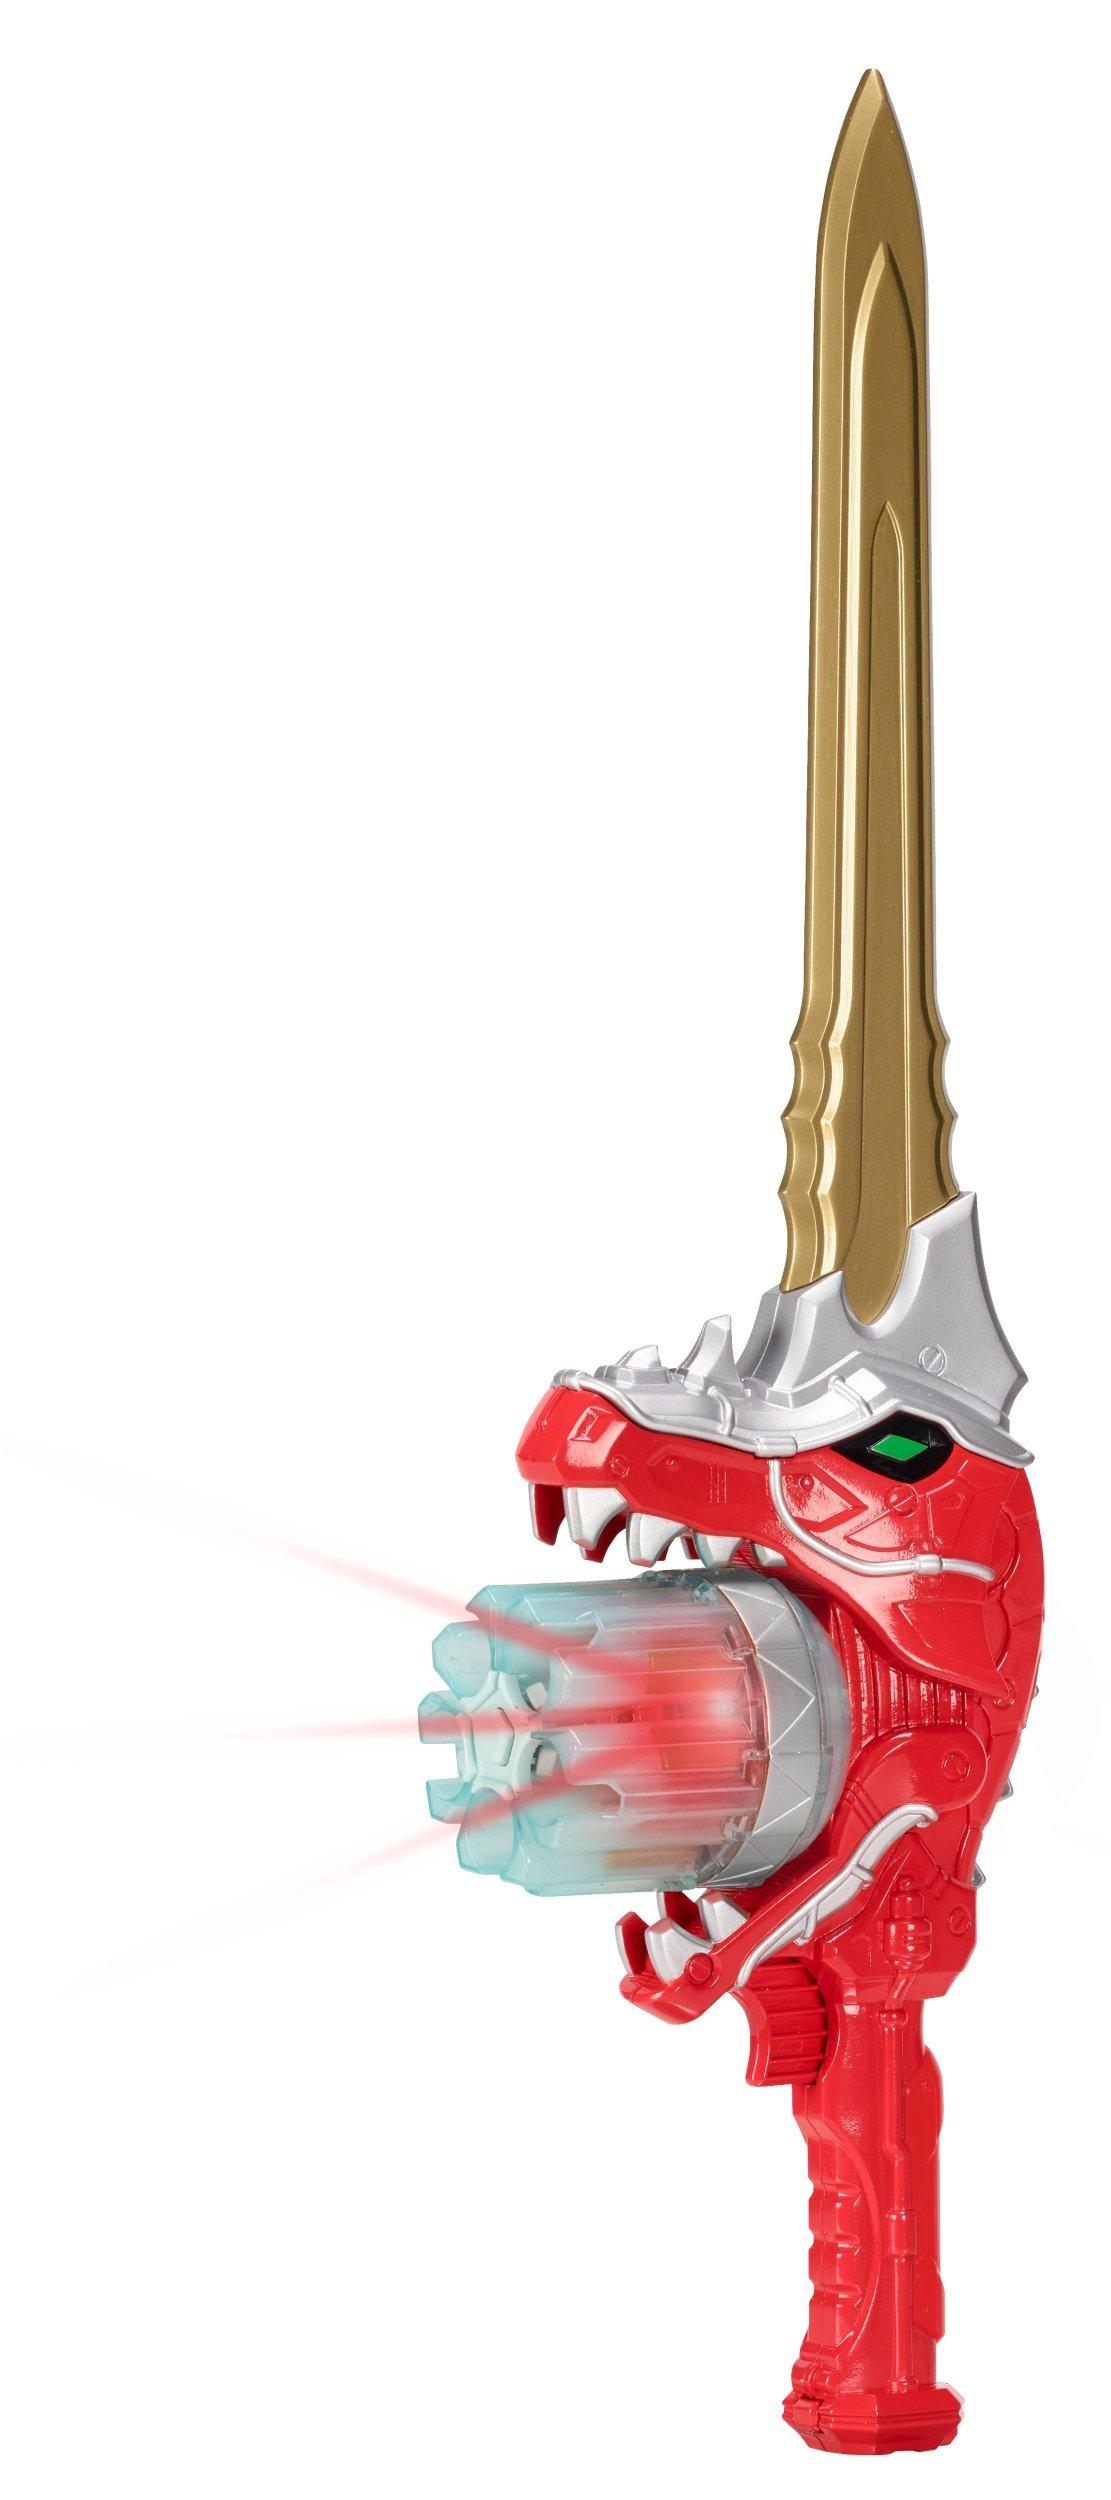 Power Rangers Dino Super Charge - Dino Super Drive Saber